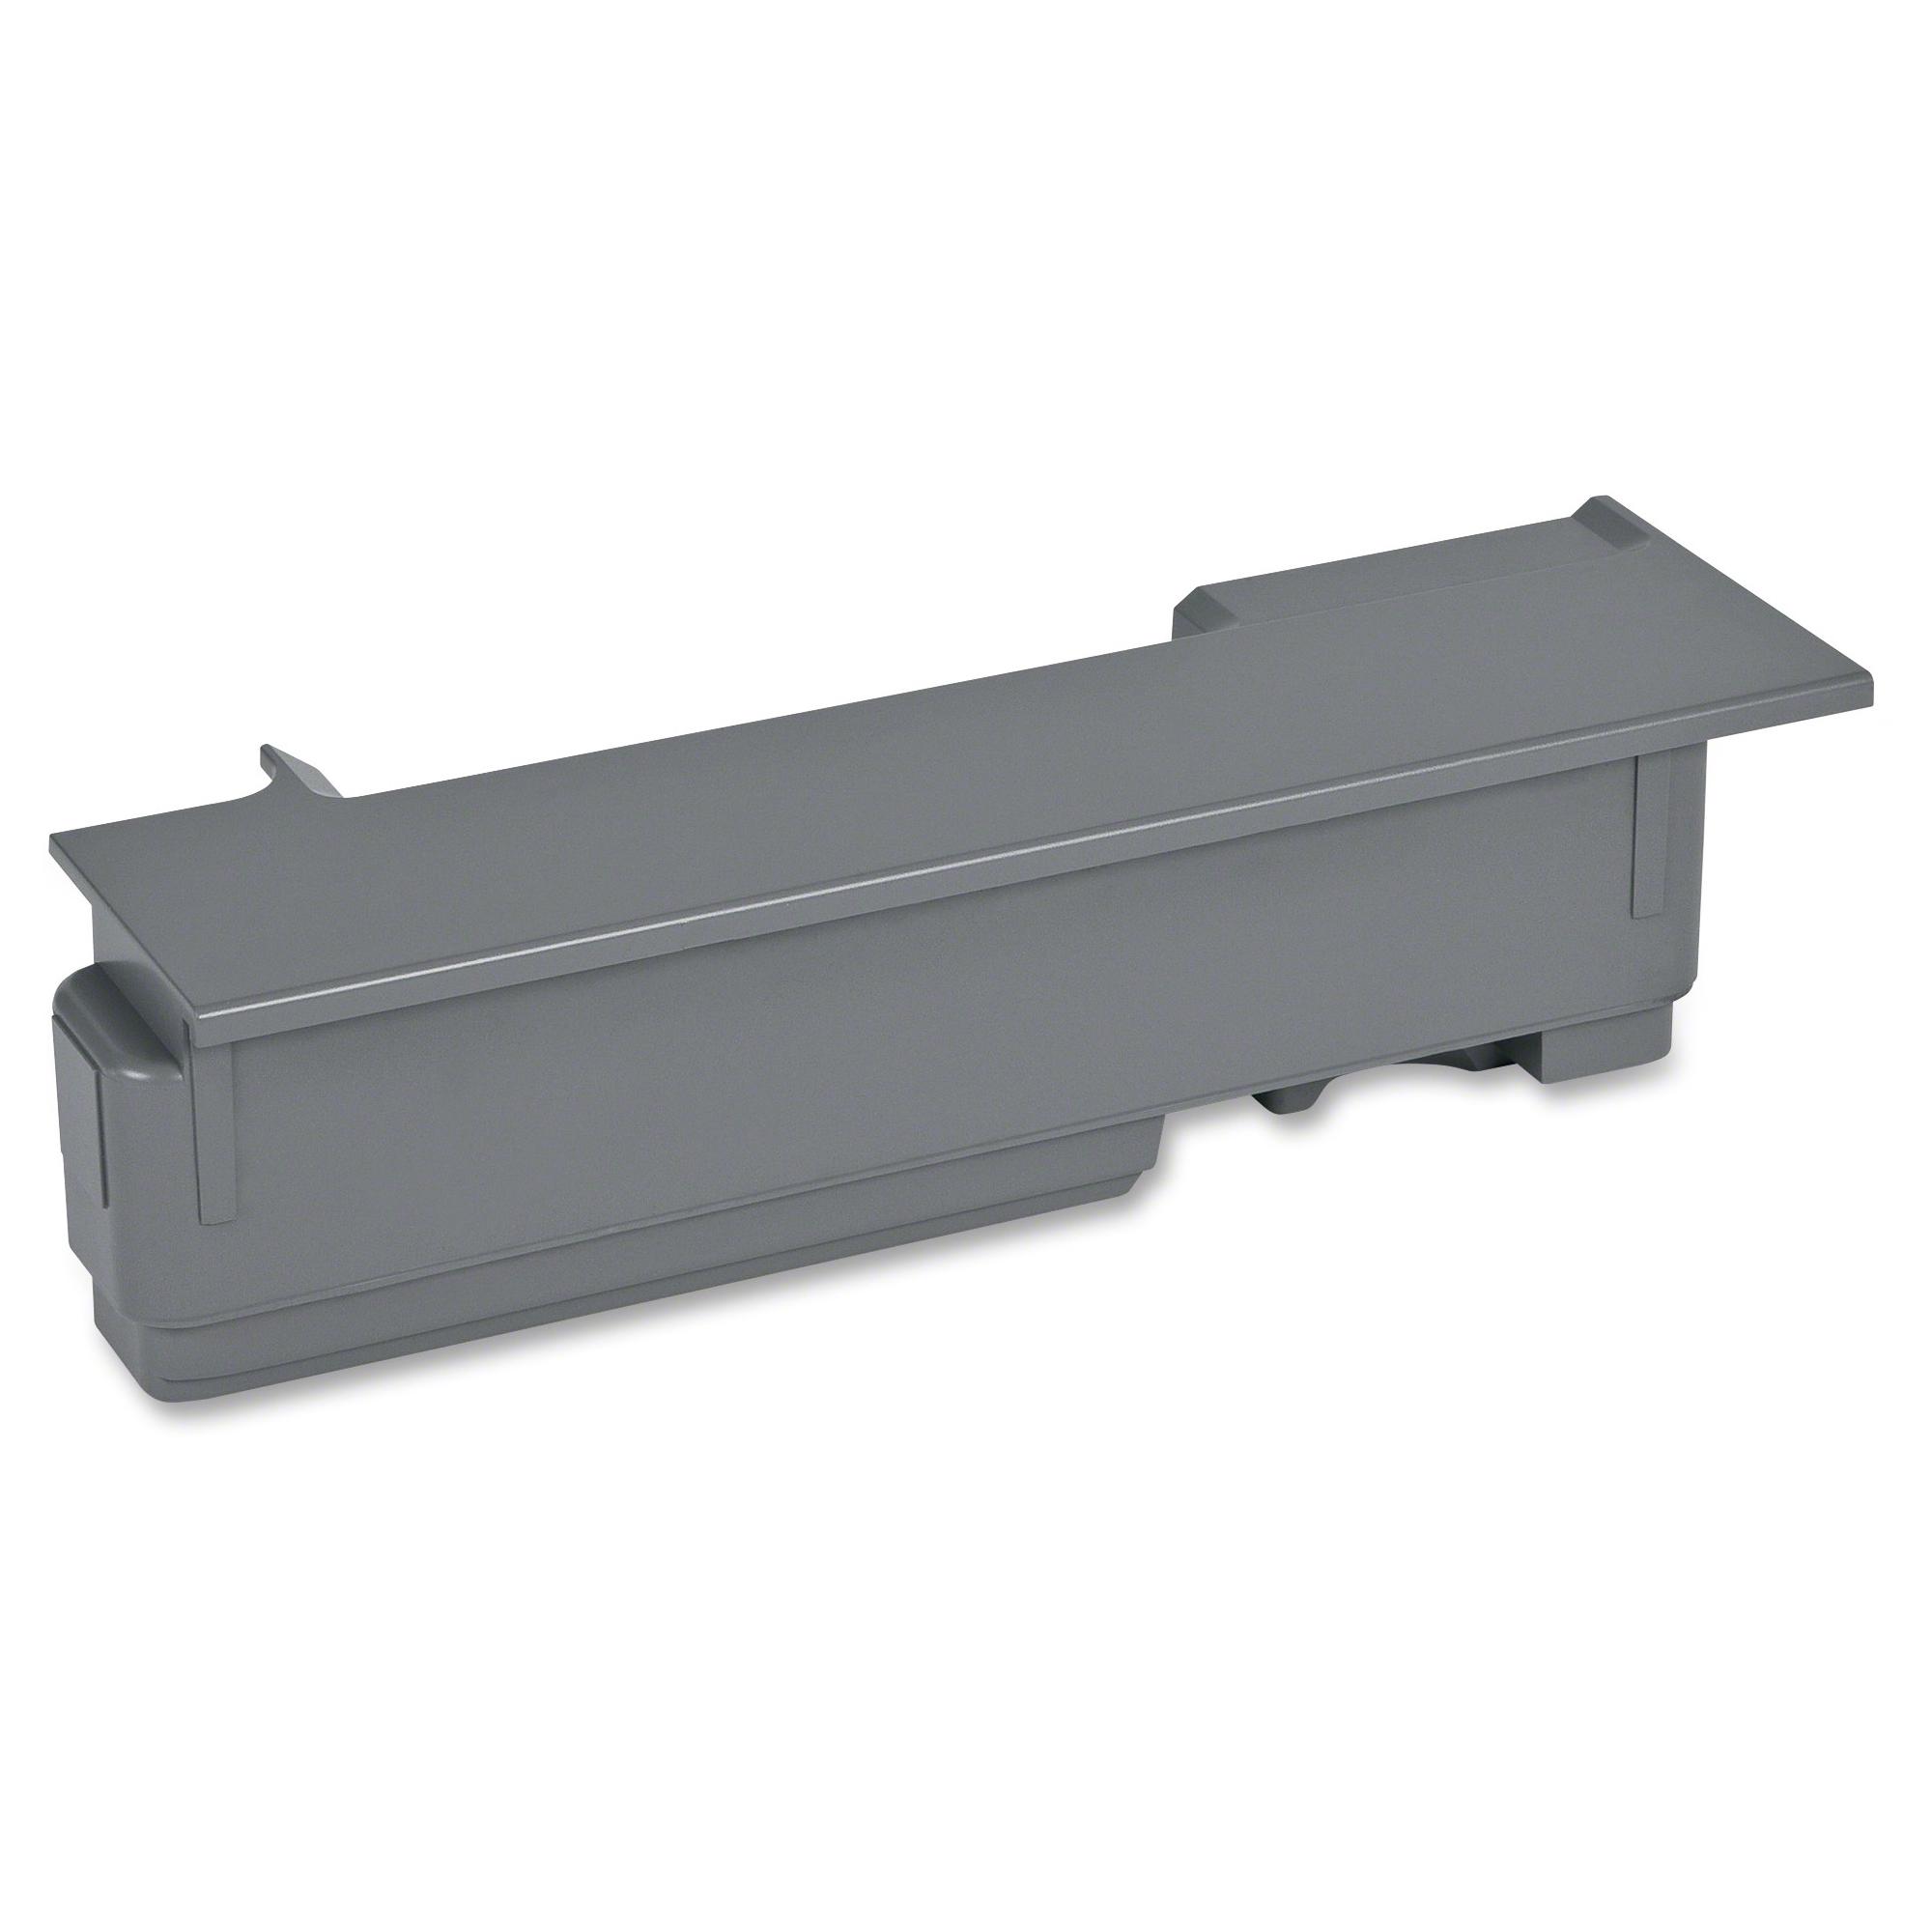 C734 C736 C746 C748 CS736 CS748 X734 X736 X738 X746 X748 XS734 XS736 XS748 Waste Toner Container (25000 Yield)